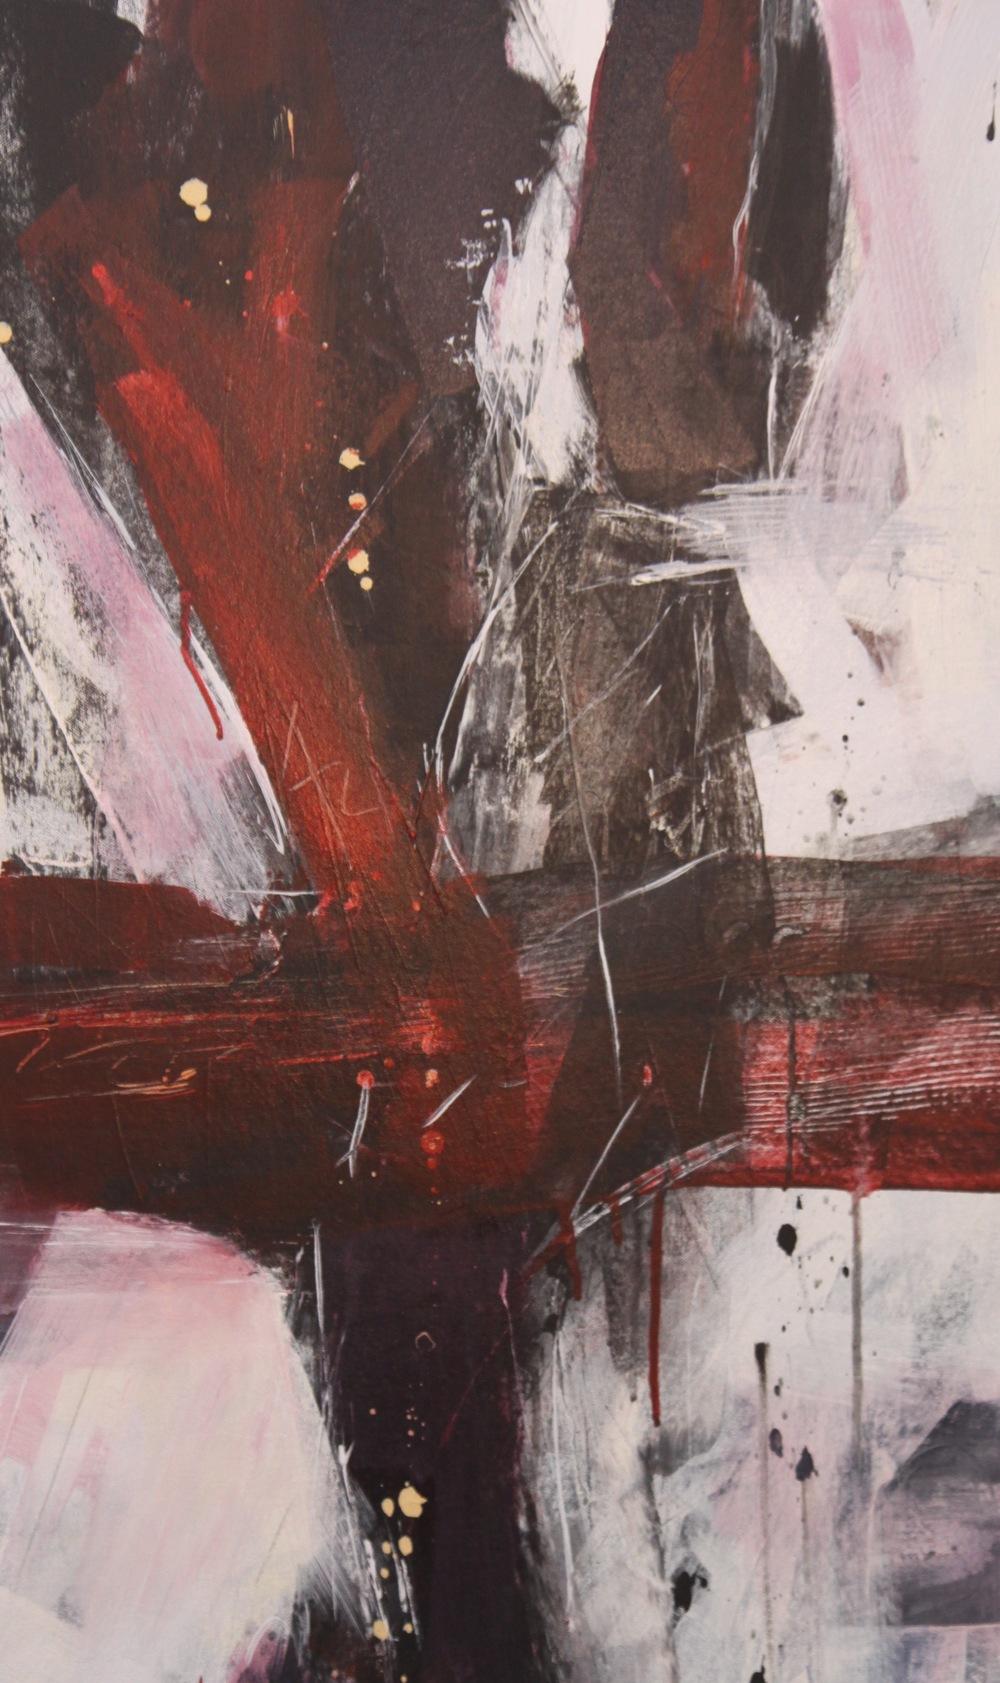 Dark_blood_26%22x36%22_Acrylics_on_canvas (1).jpg